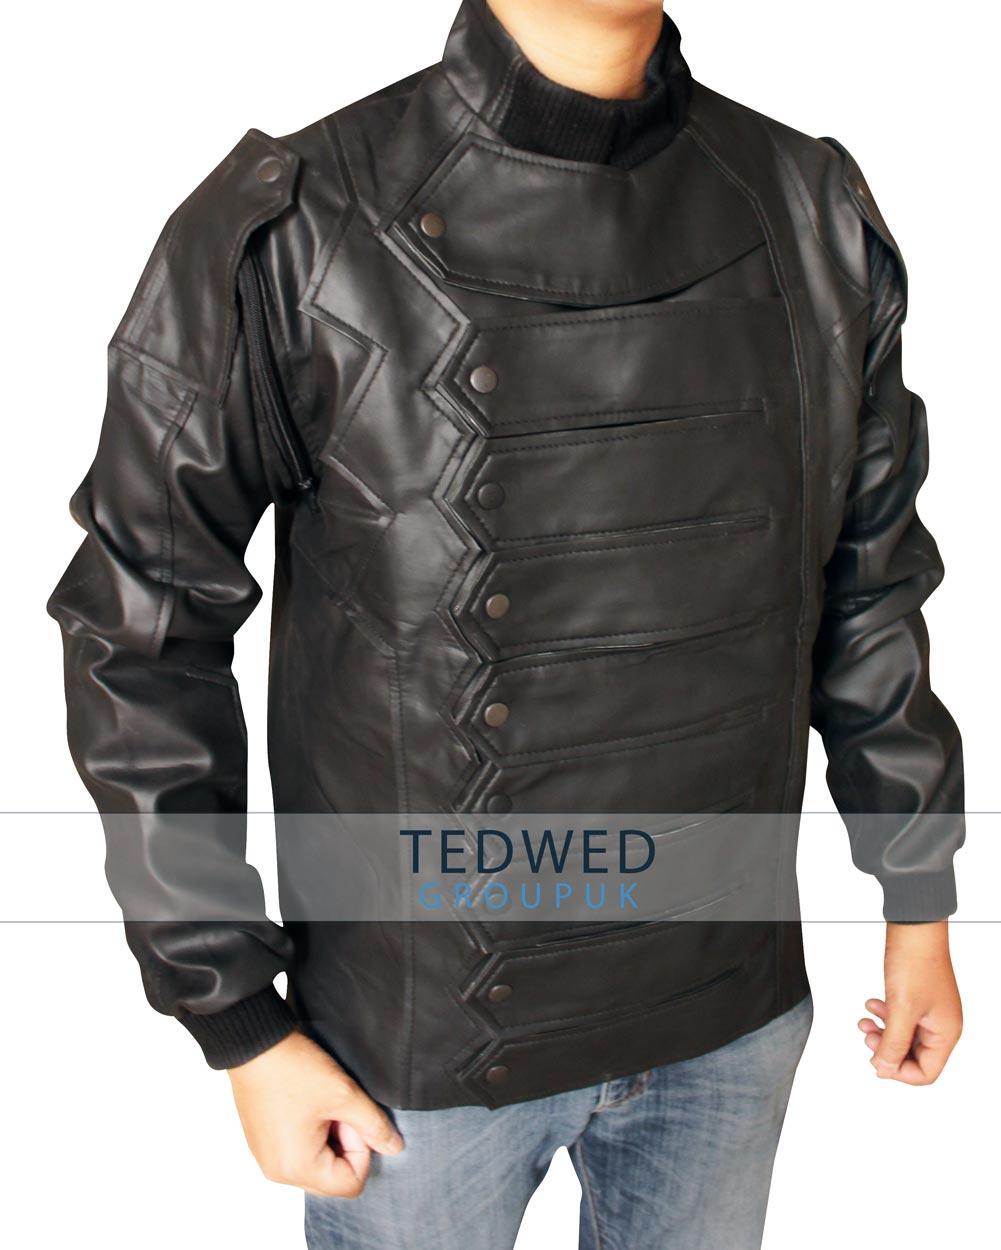 Bucky Barnes Vest Jacket